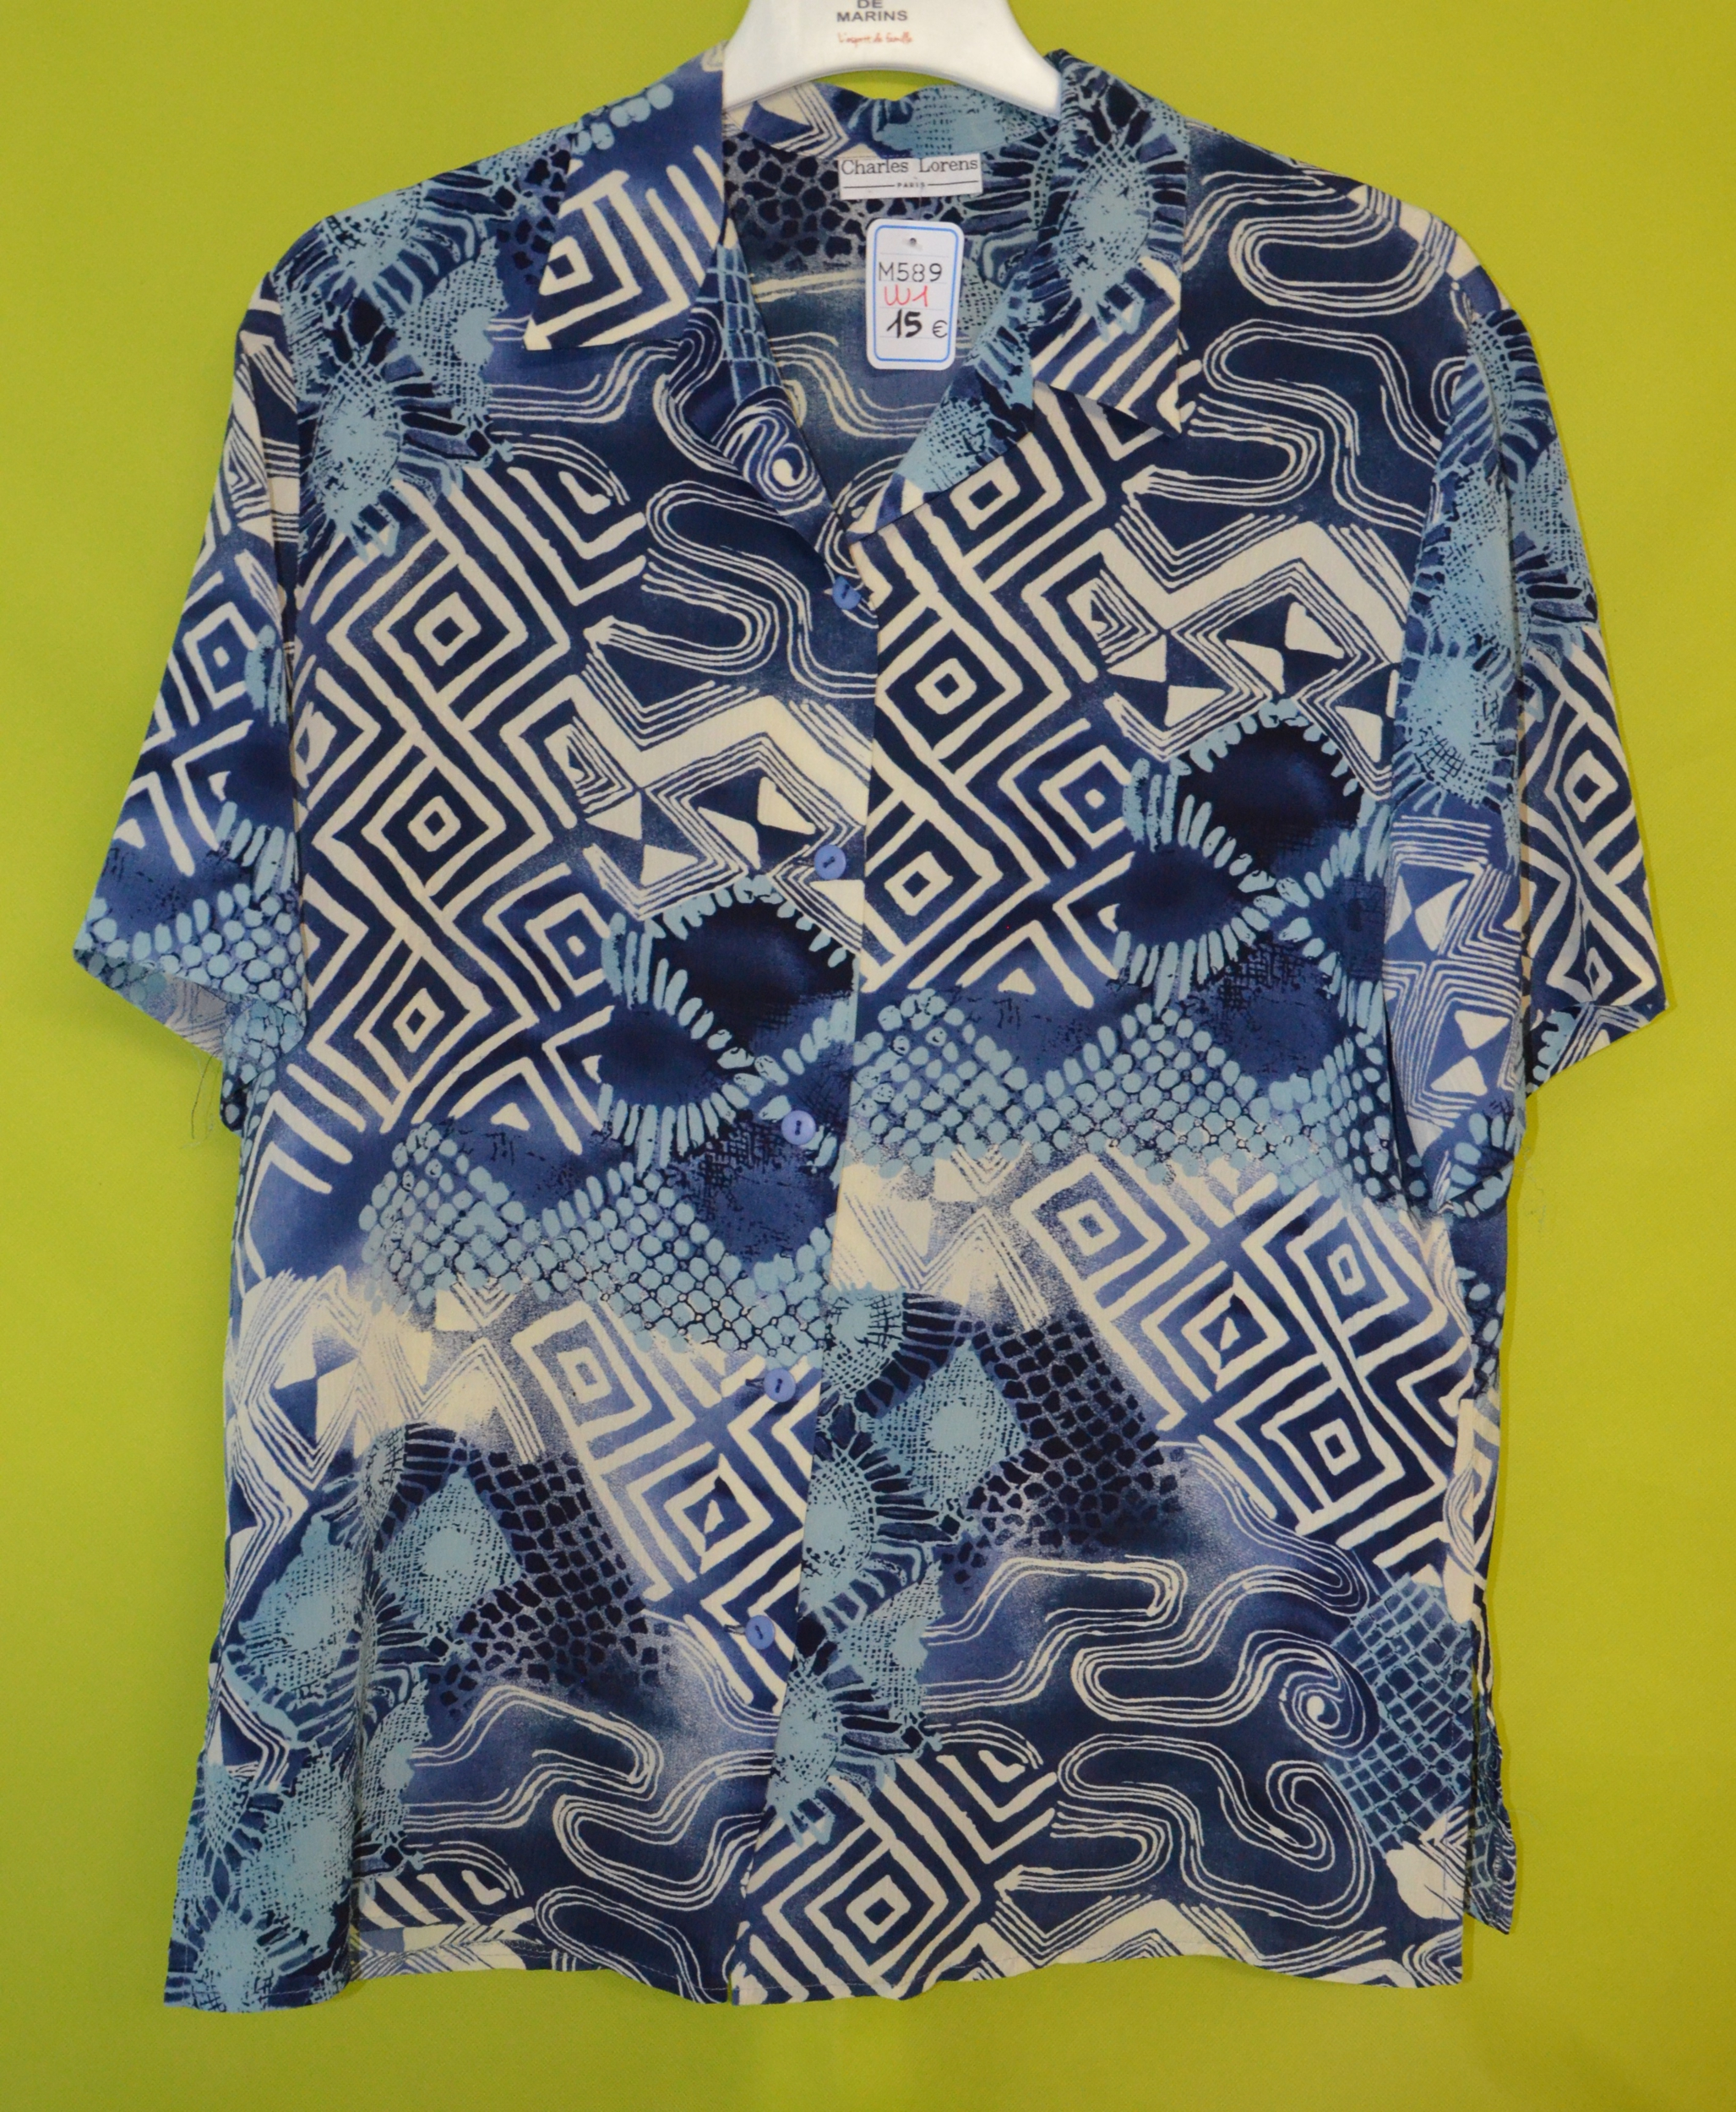 chemise femme 50 charles lorens bleu